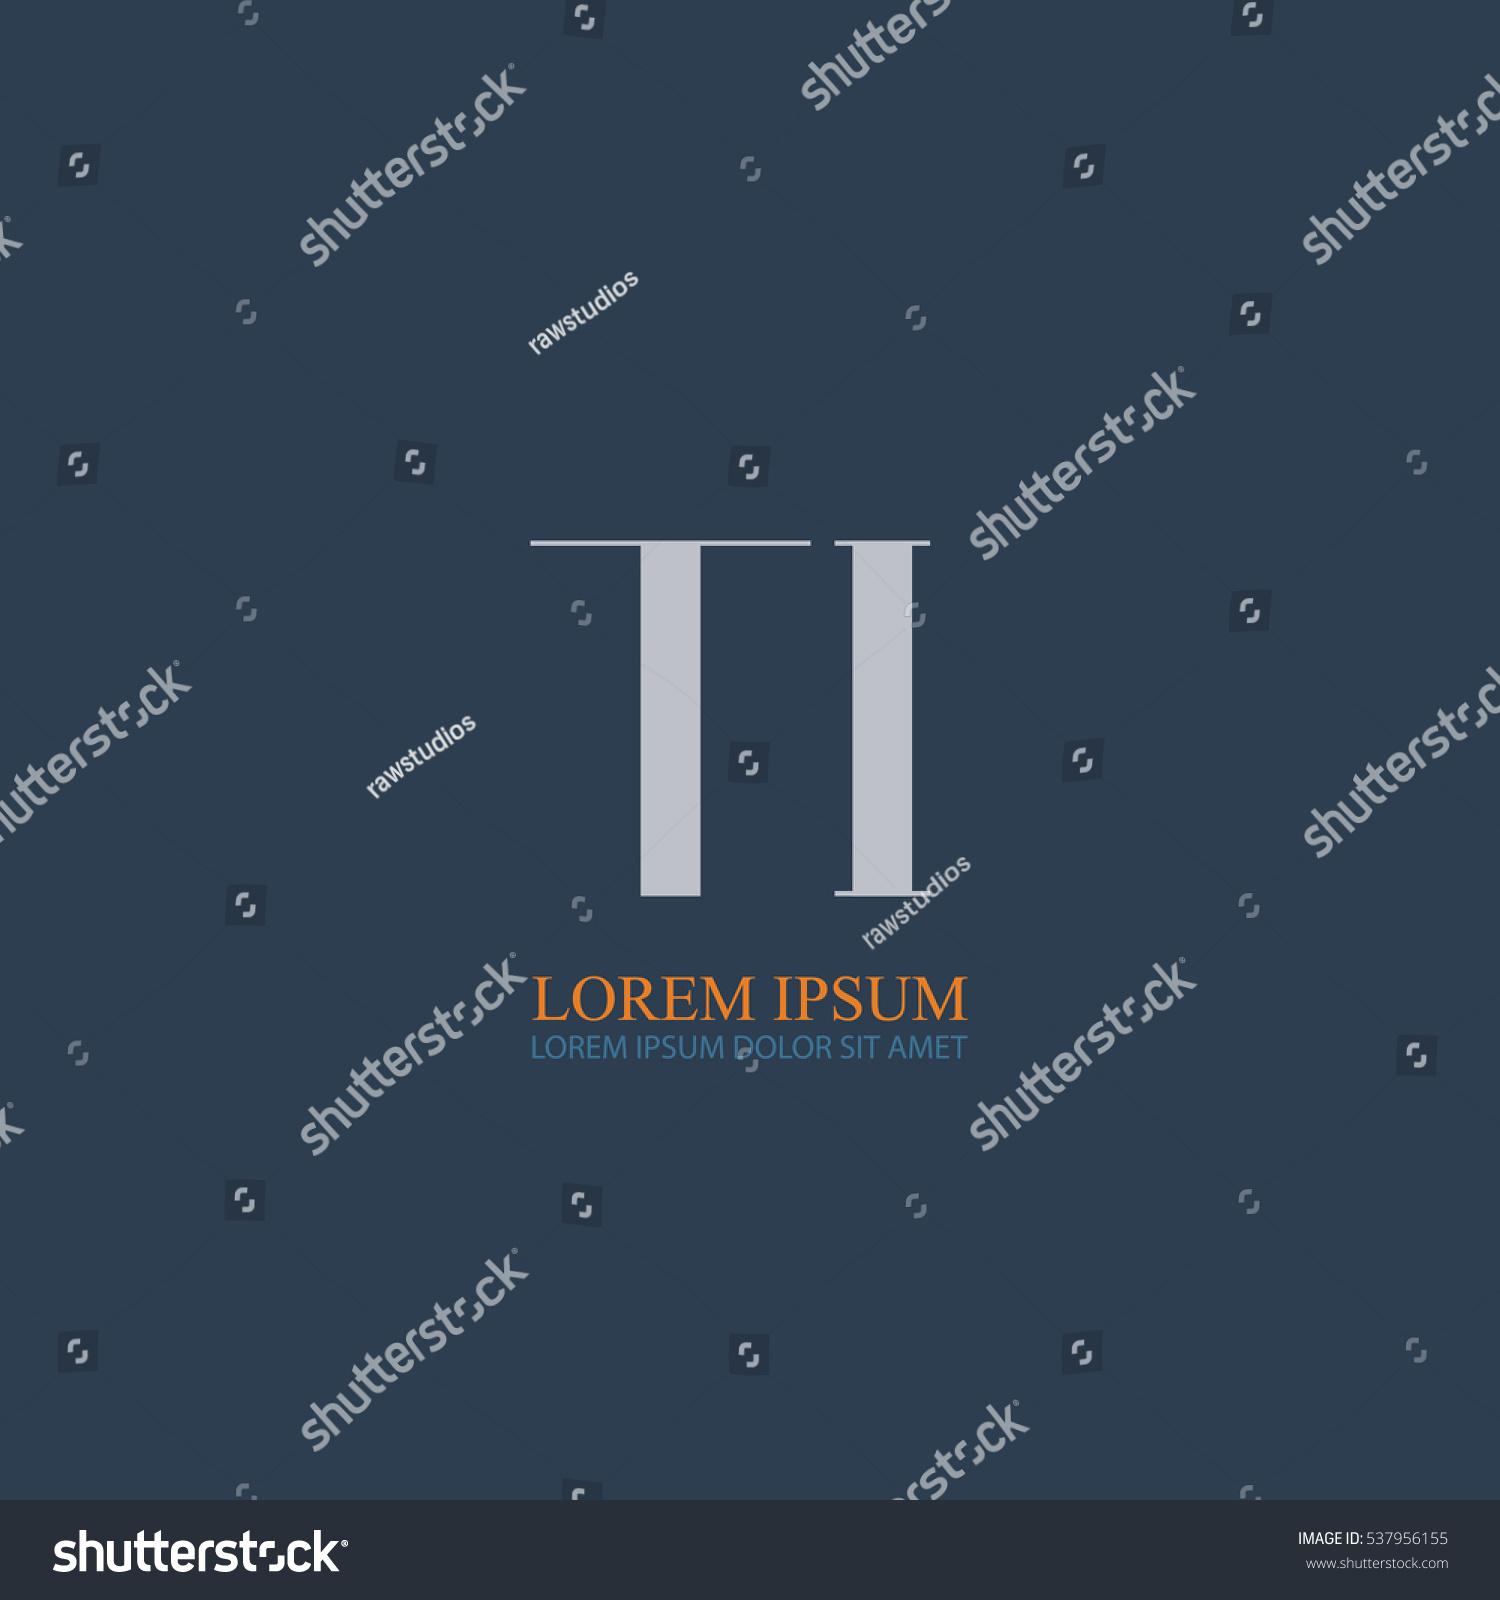 Tj initial luxury ornament monogram logo stock vector - Initial Letter Ti Logo Design For Company Identity